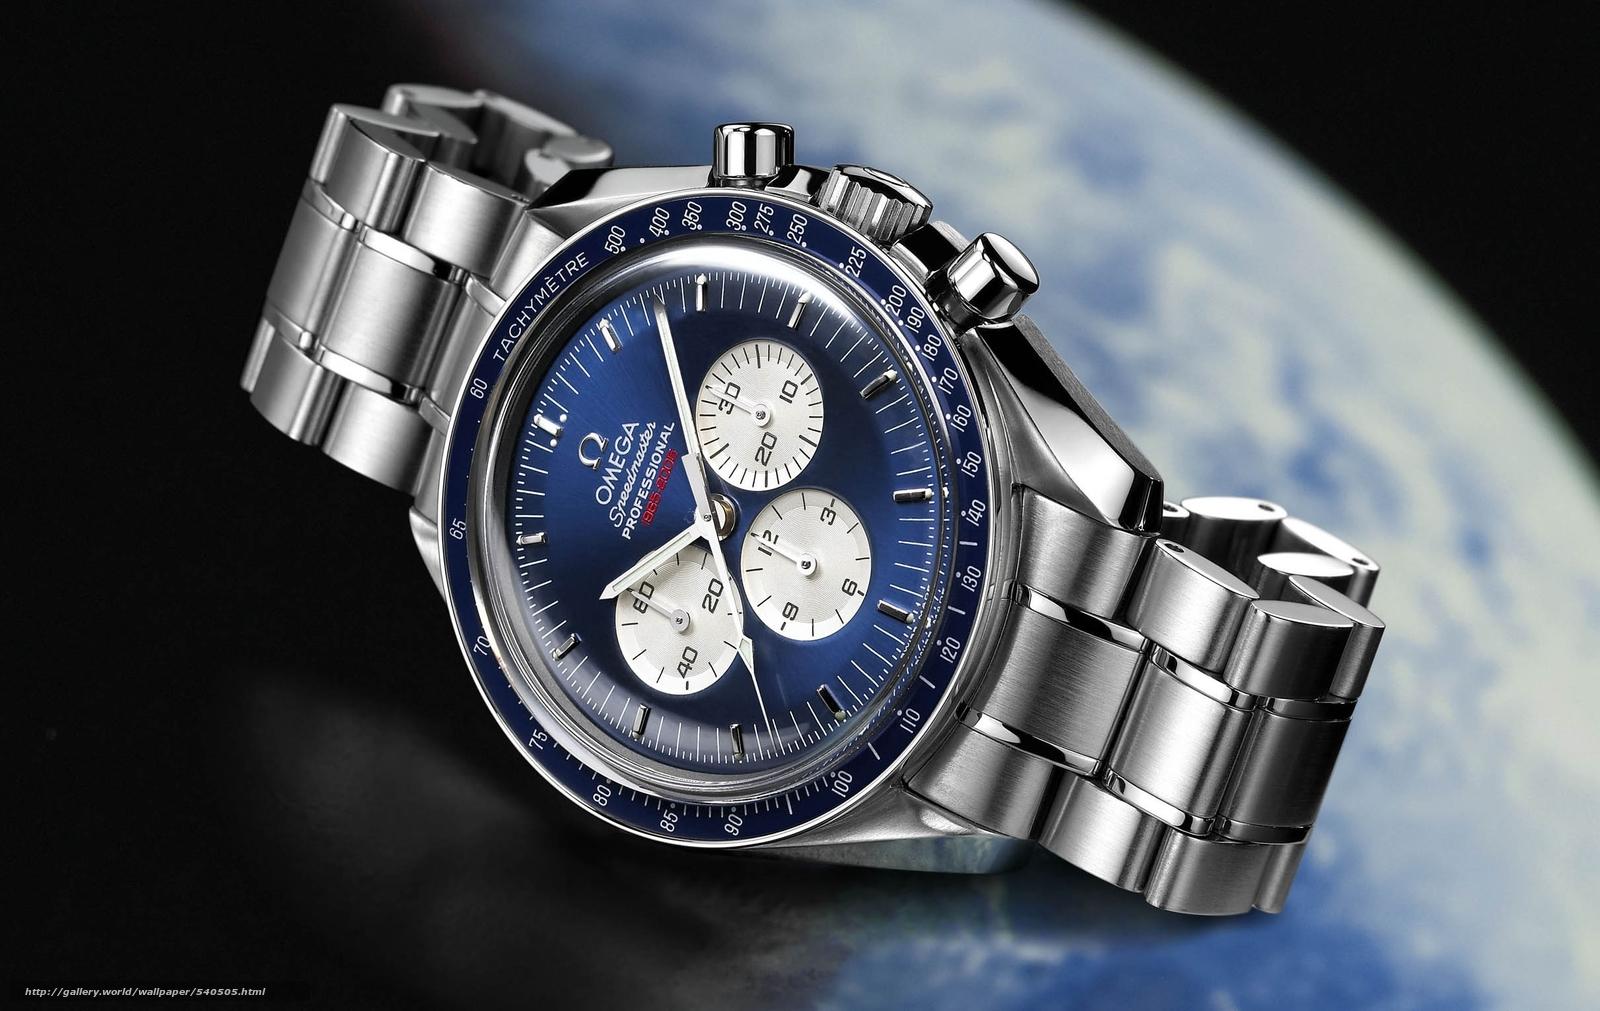 Download wallpaper watch OMEGA speedmaster Professional desktop 1600x1011